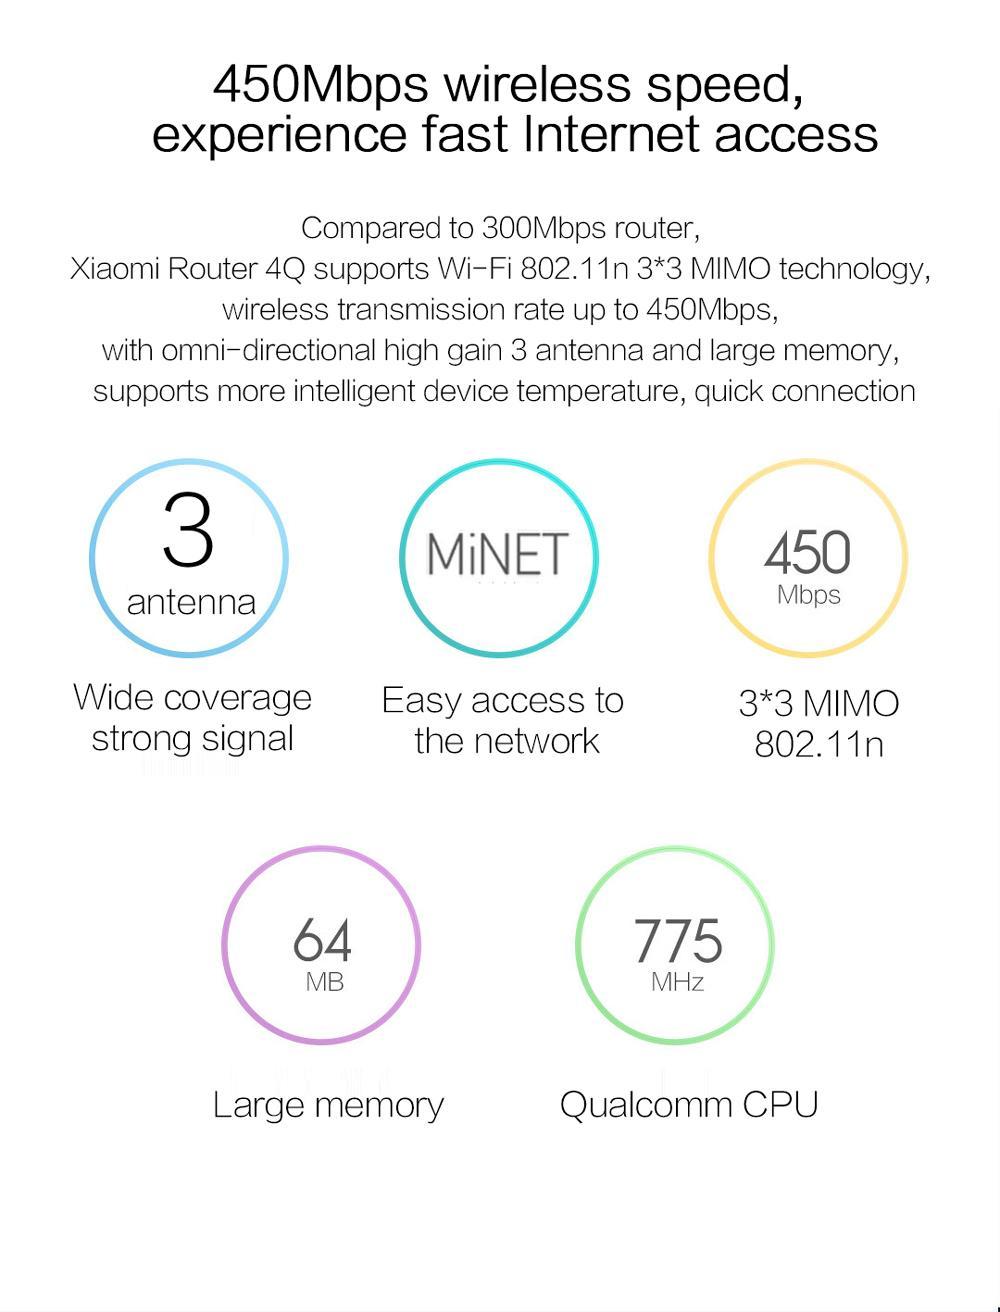 New Original Xiaomi Mi Router 4Q 3 Antennas Blue Wireless 2.4G 802.11bgn 450Mbps APP Control 64M ROMRAM Wifi Wireless Routers-7